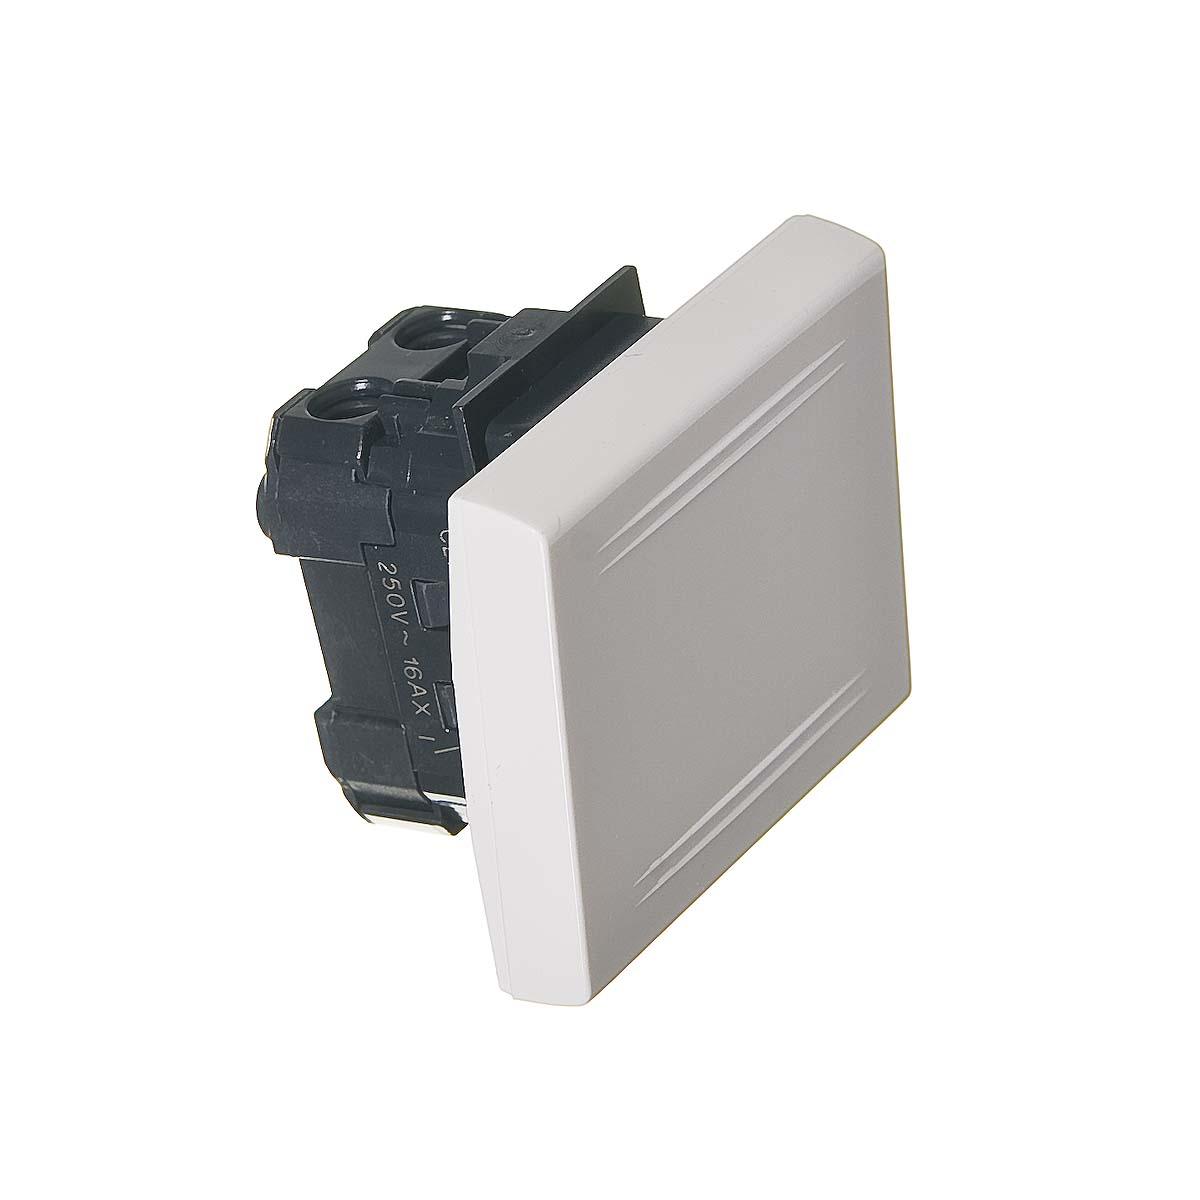 Выключатель для кабель-канала ДКС белый 2 модуля, Viva